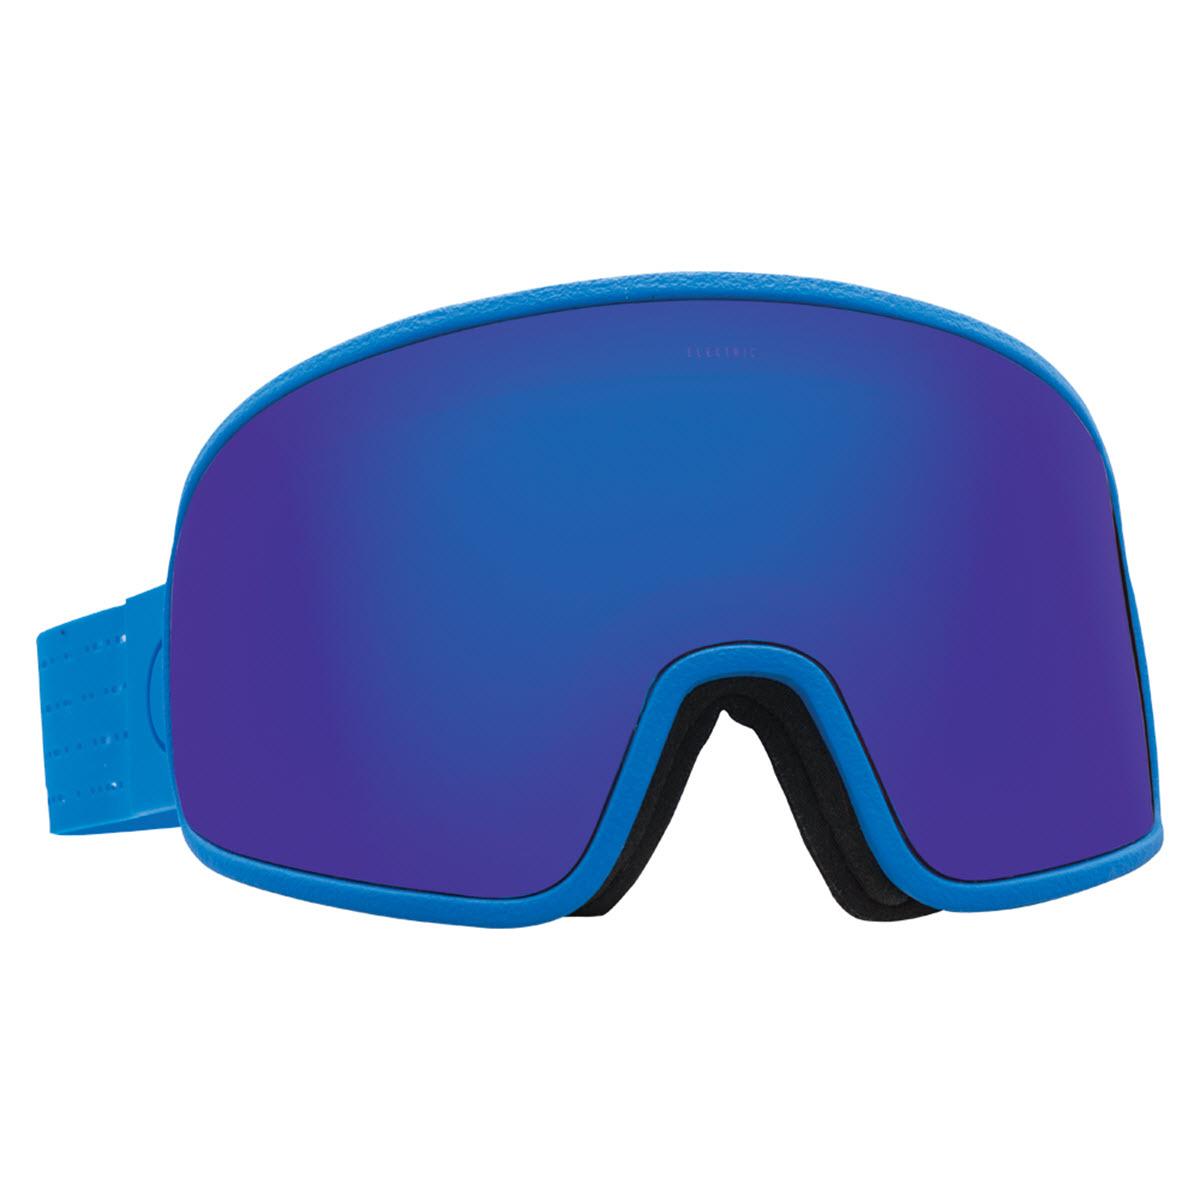 98c31f5423b Electric Electrolite Snowboard Goggles 2017 Royal Blue Brose Blue Chrome